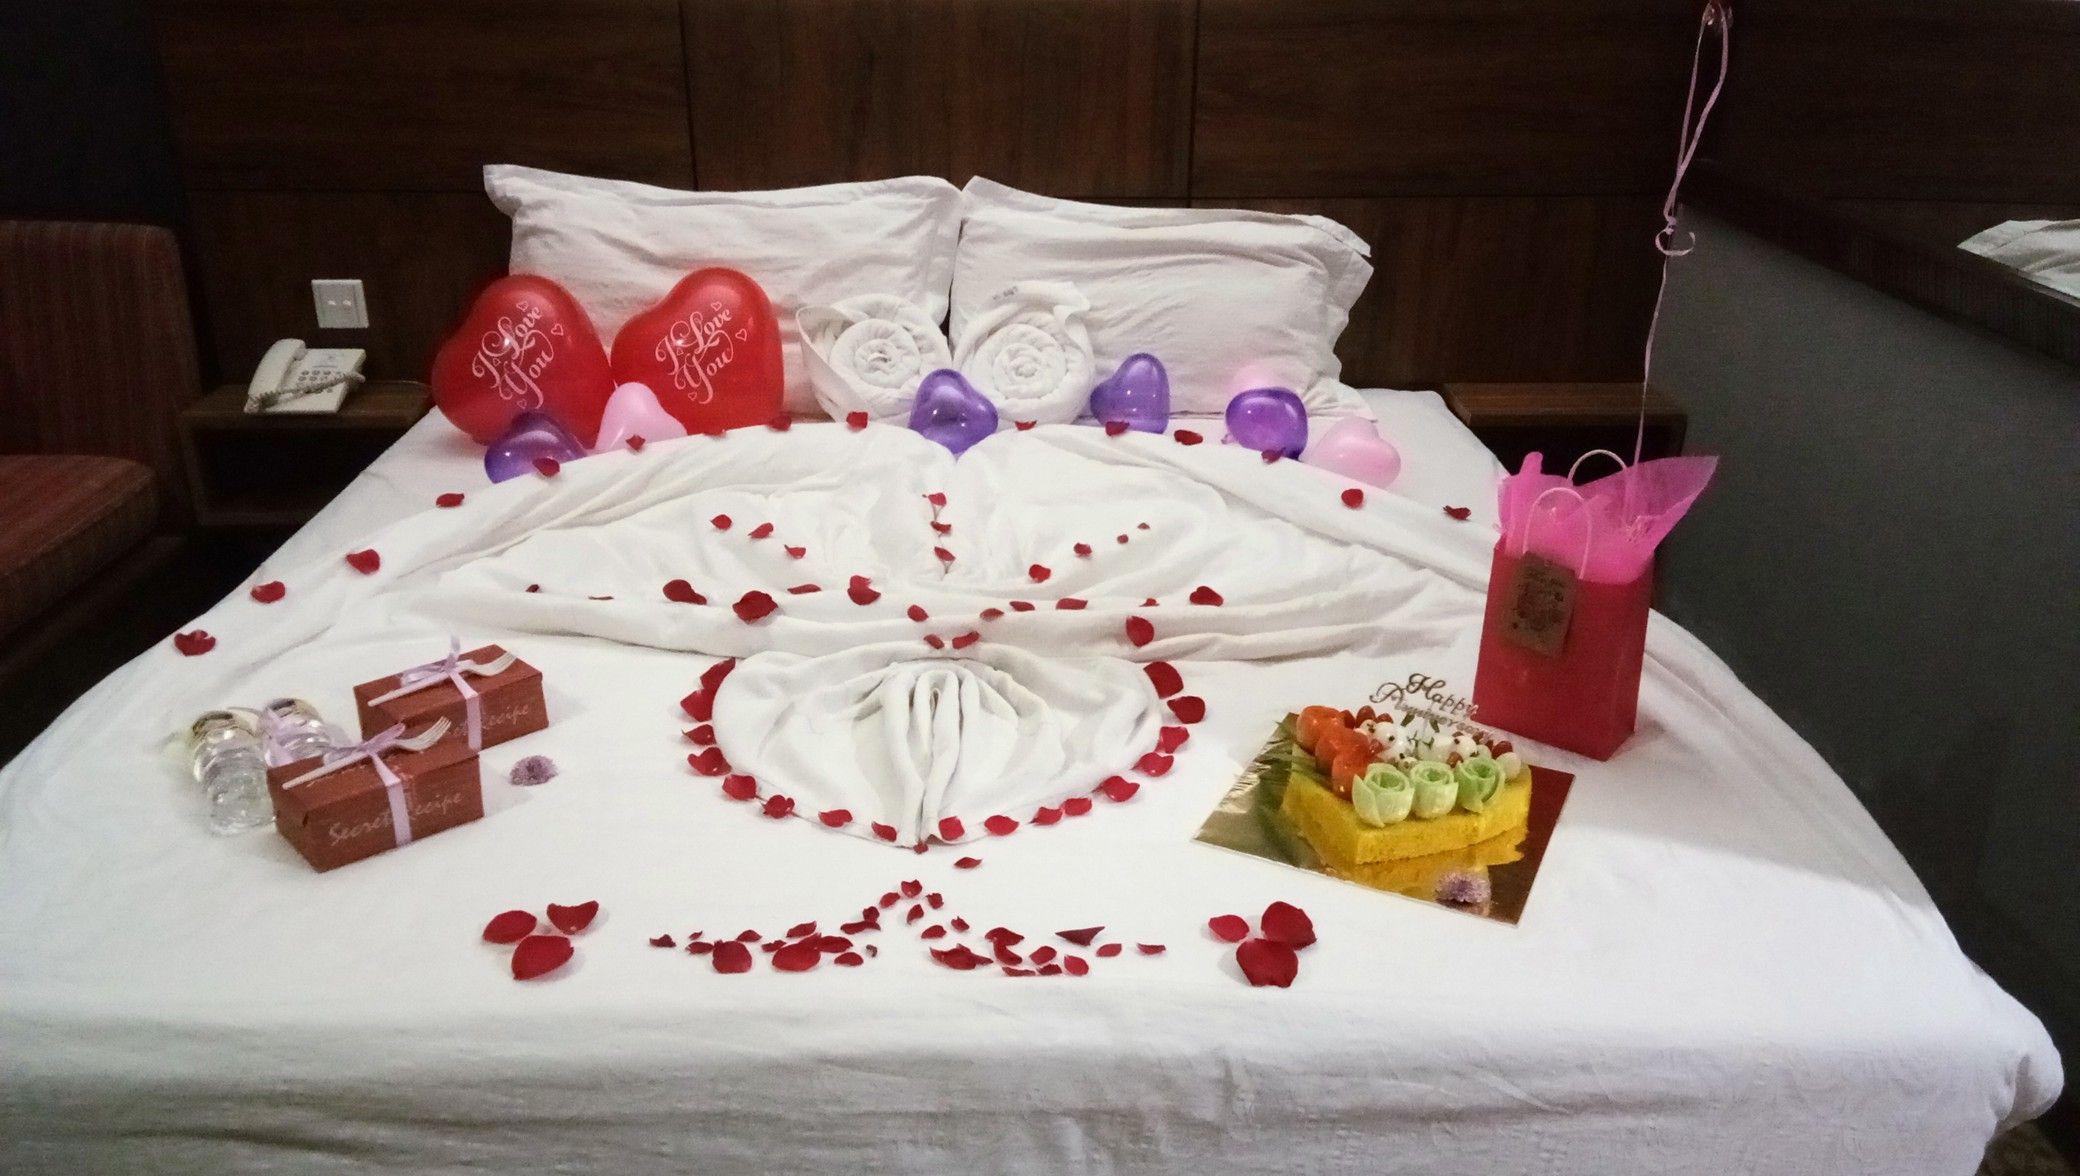 Room Deco Honeymoon By Langkawi Surprise Heart Honeymoon Bedroom Honeymoon Rooms Wedding Bedroom